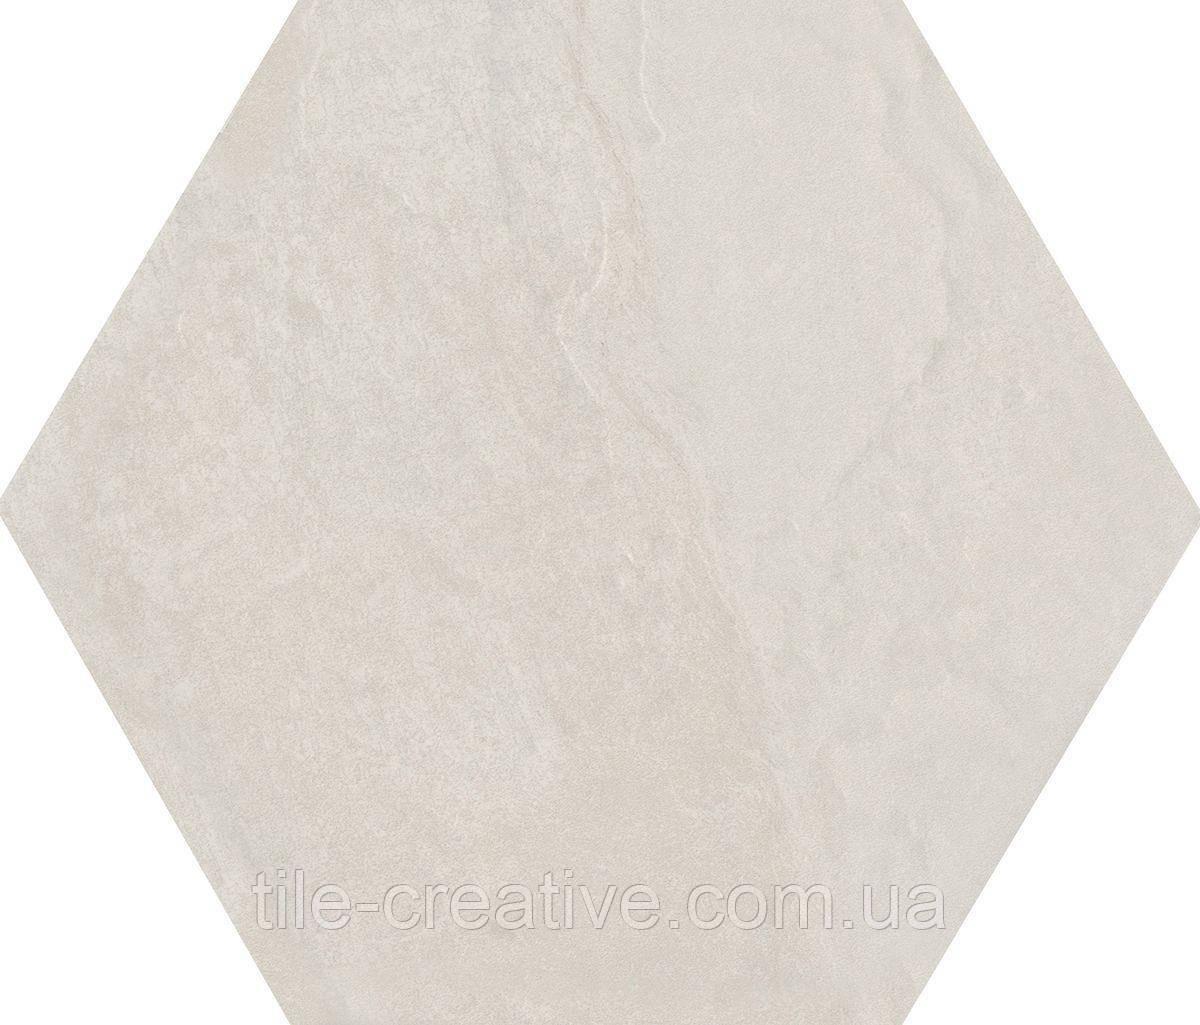 Керамическая плитка Рамбла беж 20x23,1x7 SG23035N